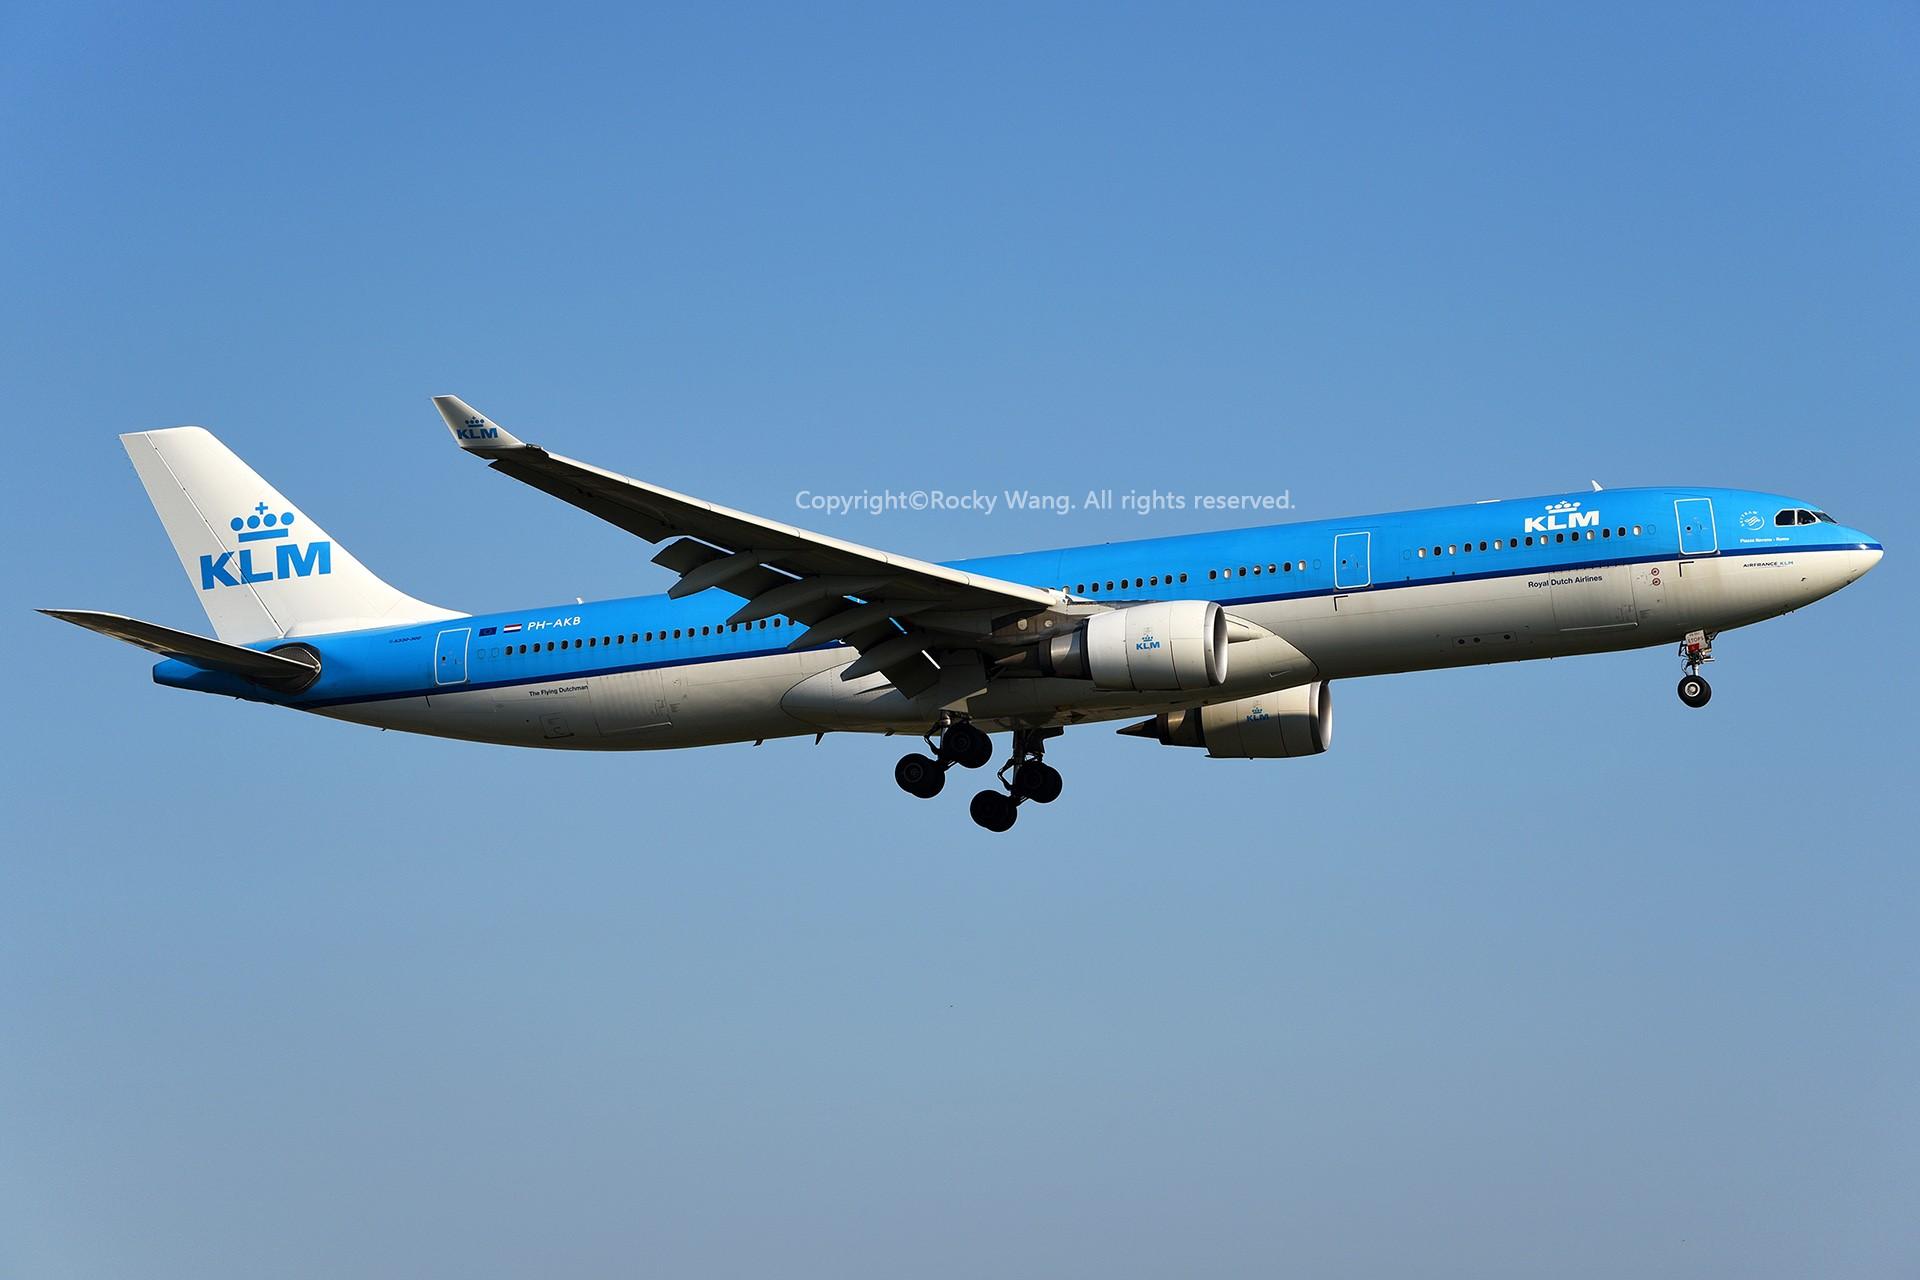 Re:[原创]A330s Around the World AIRBUS A330-303 PH-AKB 加拿大蒙特利尔特鲁多机场